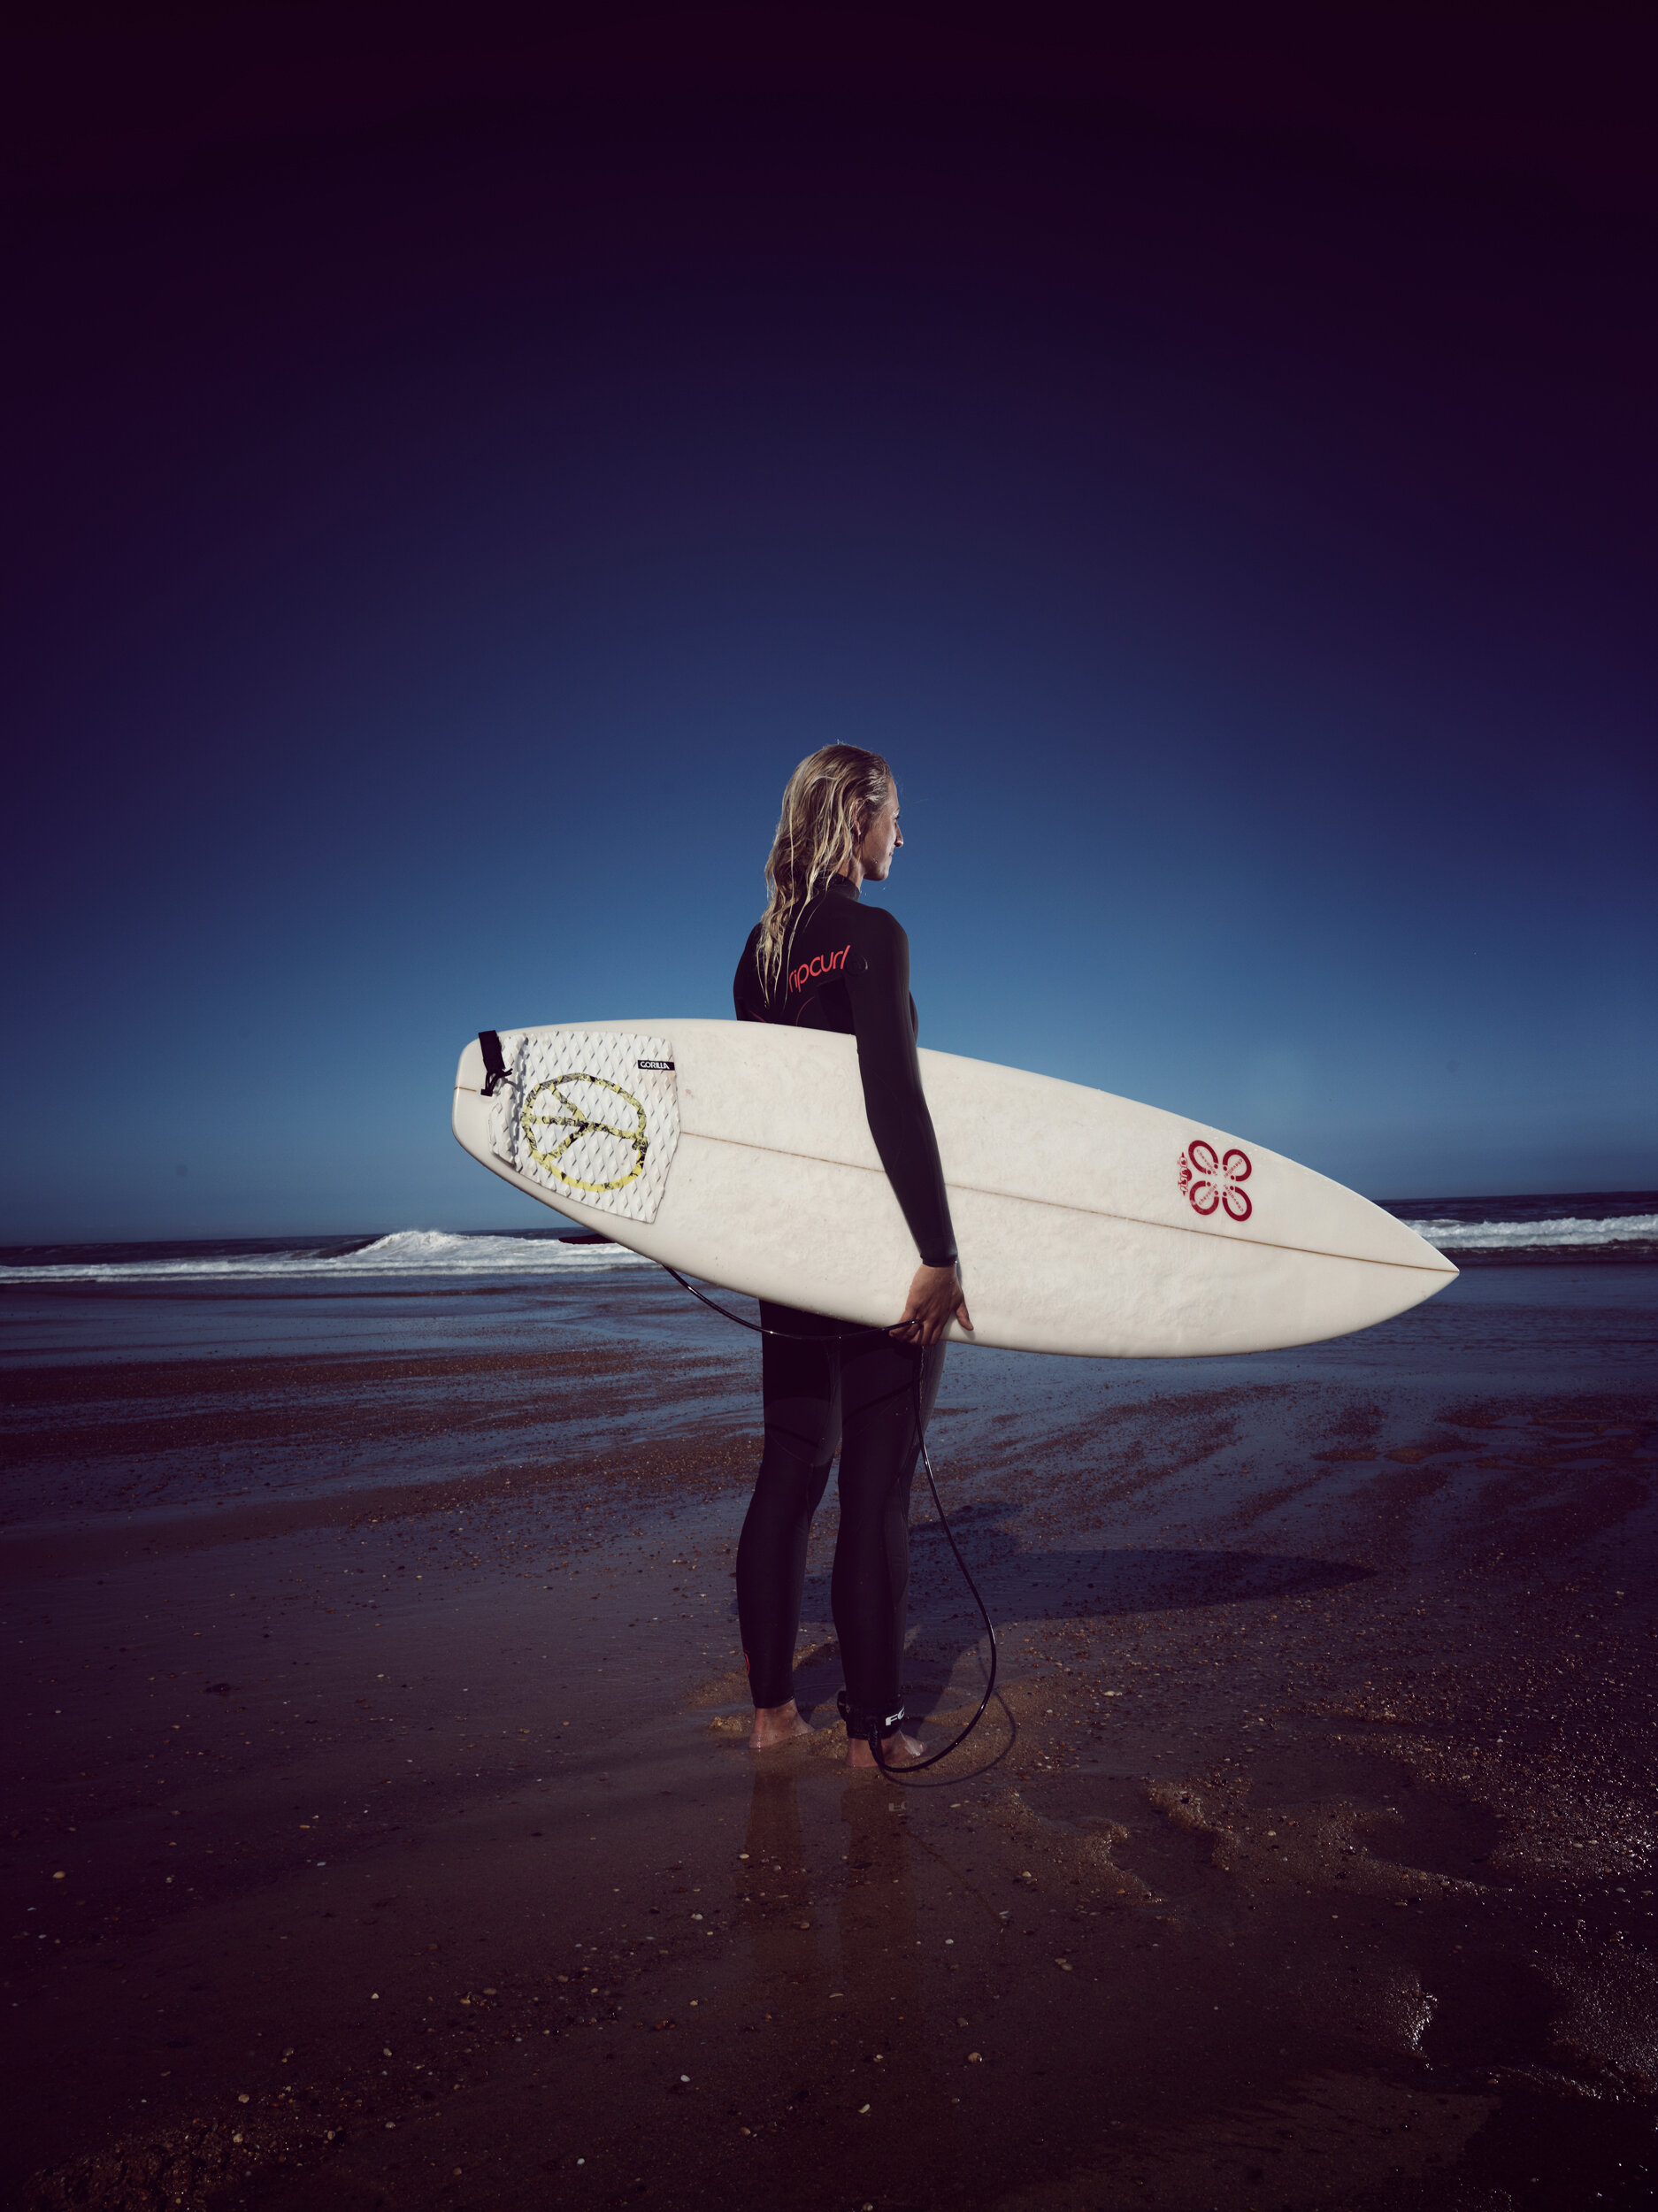 Surf_7.jpg